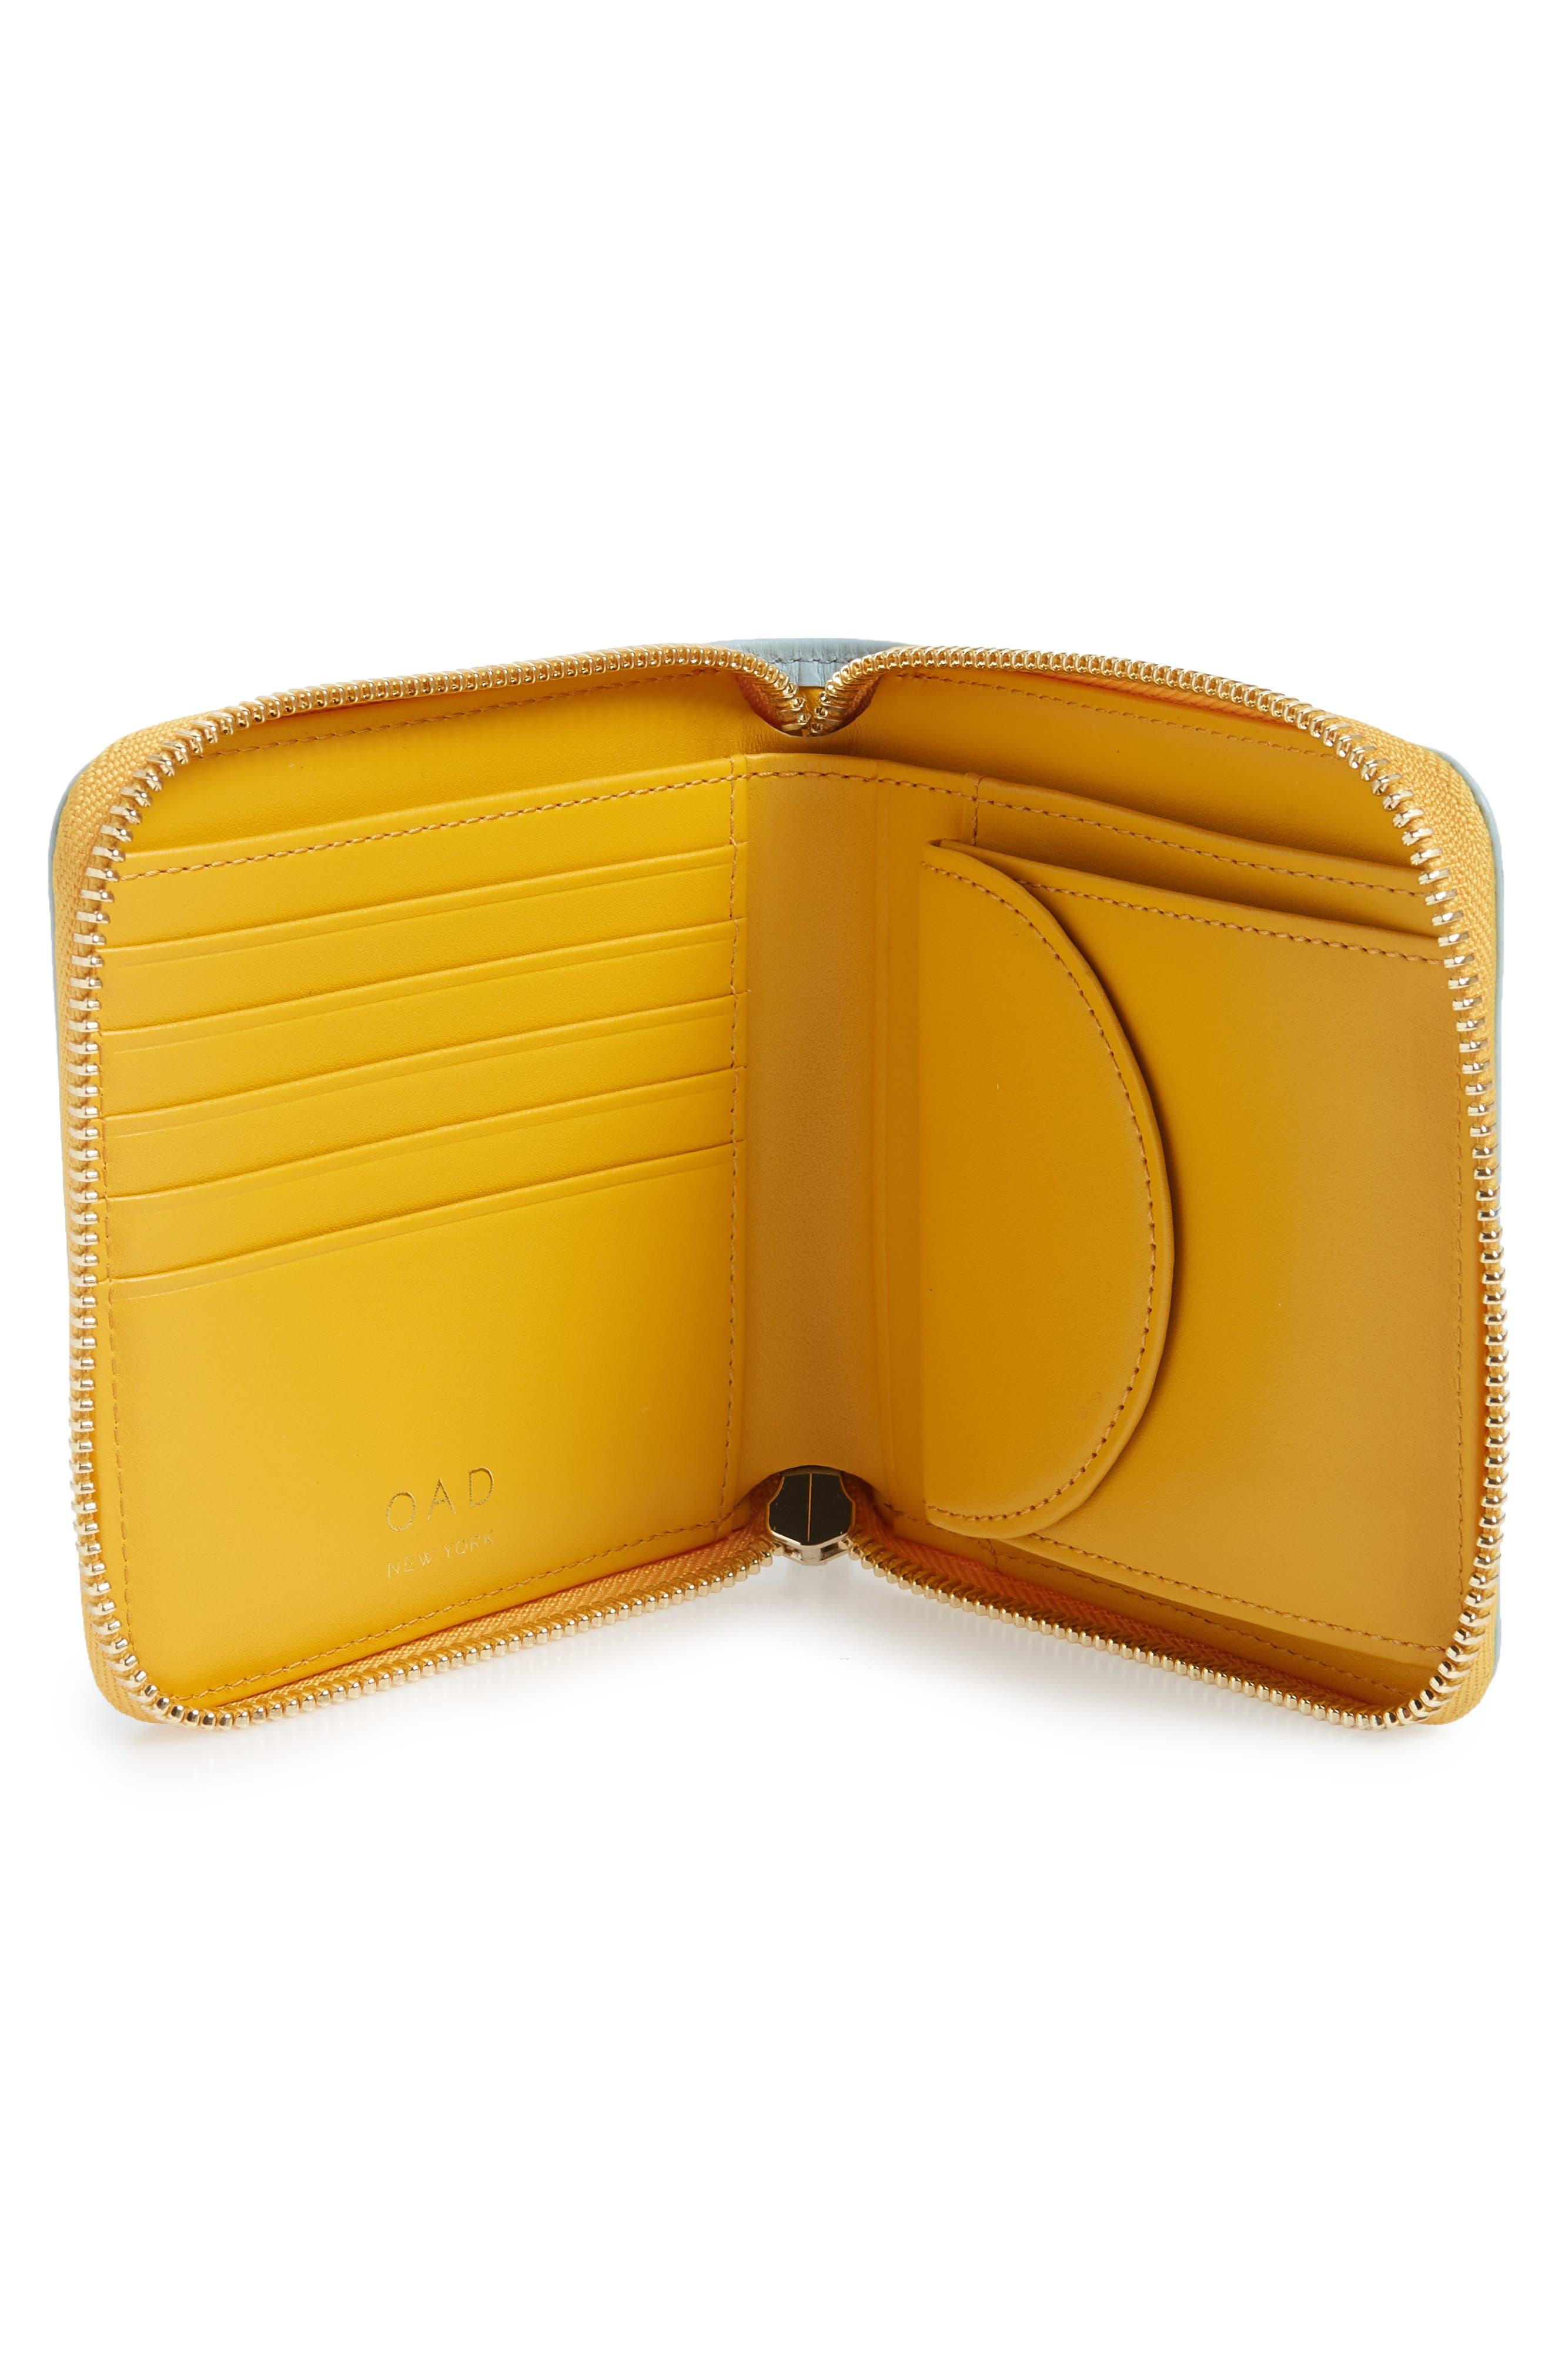 Half Zip Carryall Wallet,                             Alternate thumbnail 2, color,                             CLOUD BLUE/ HONEY